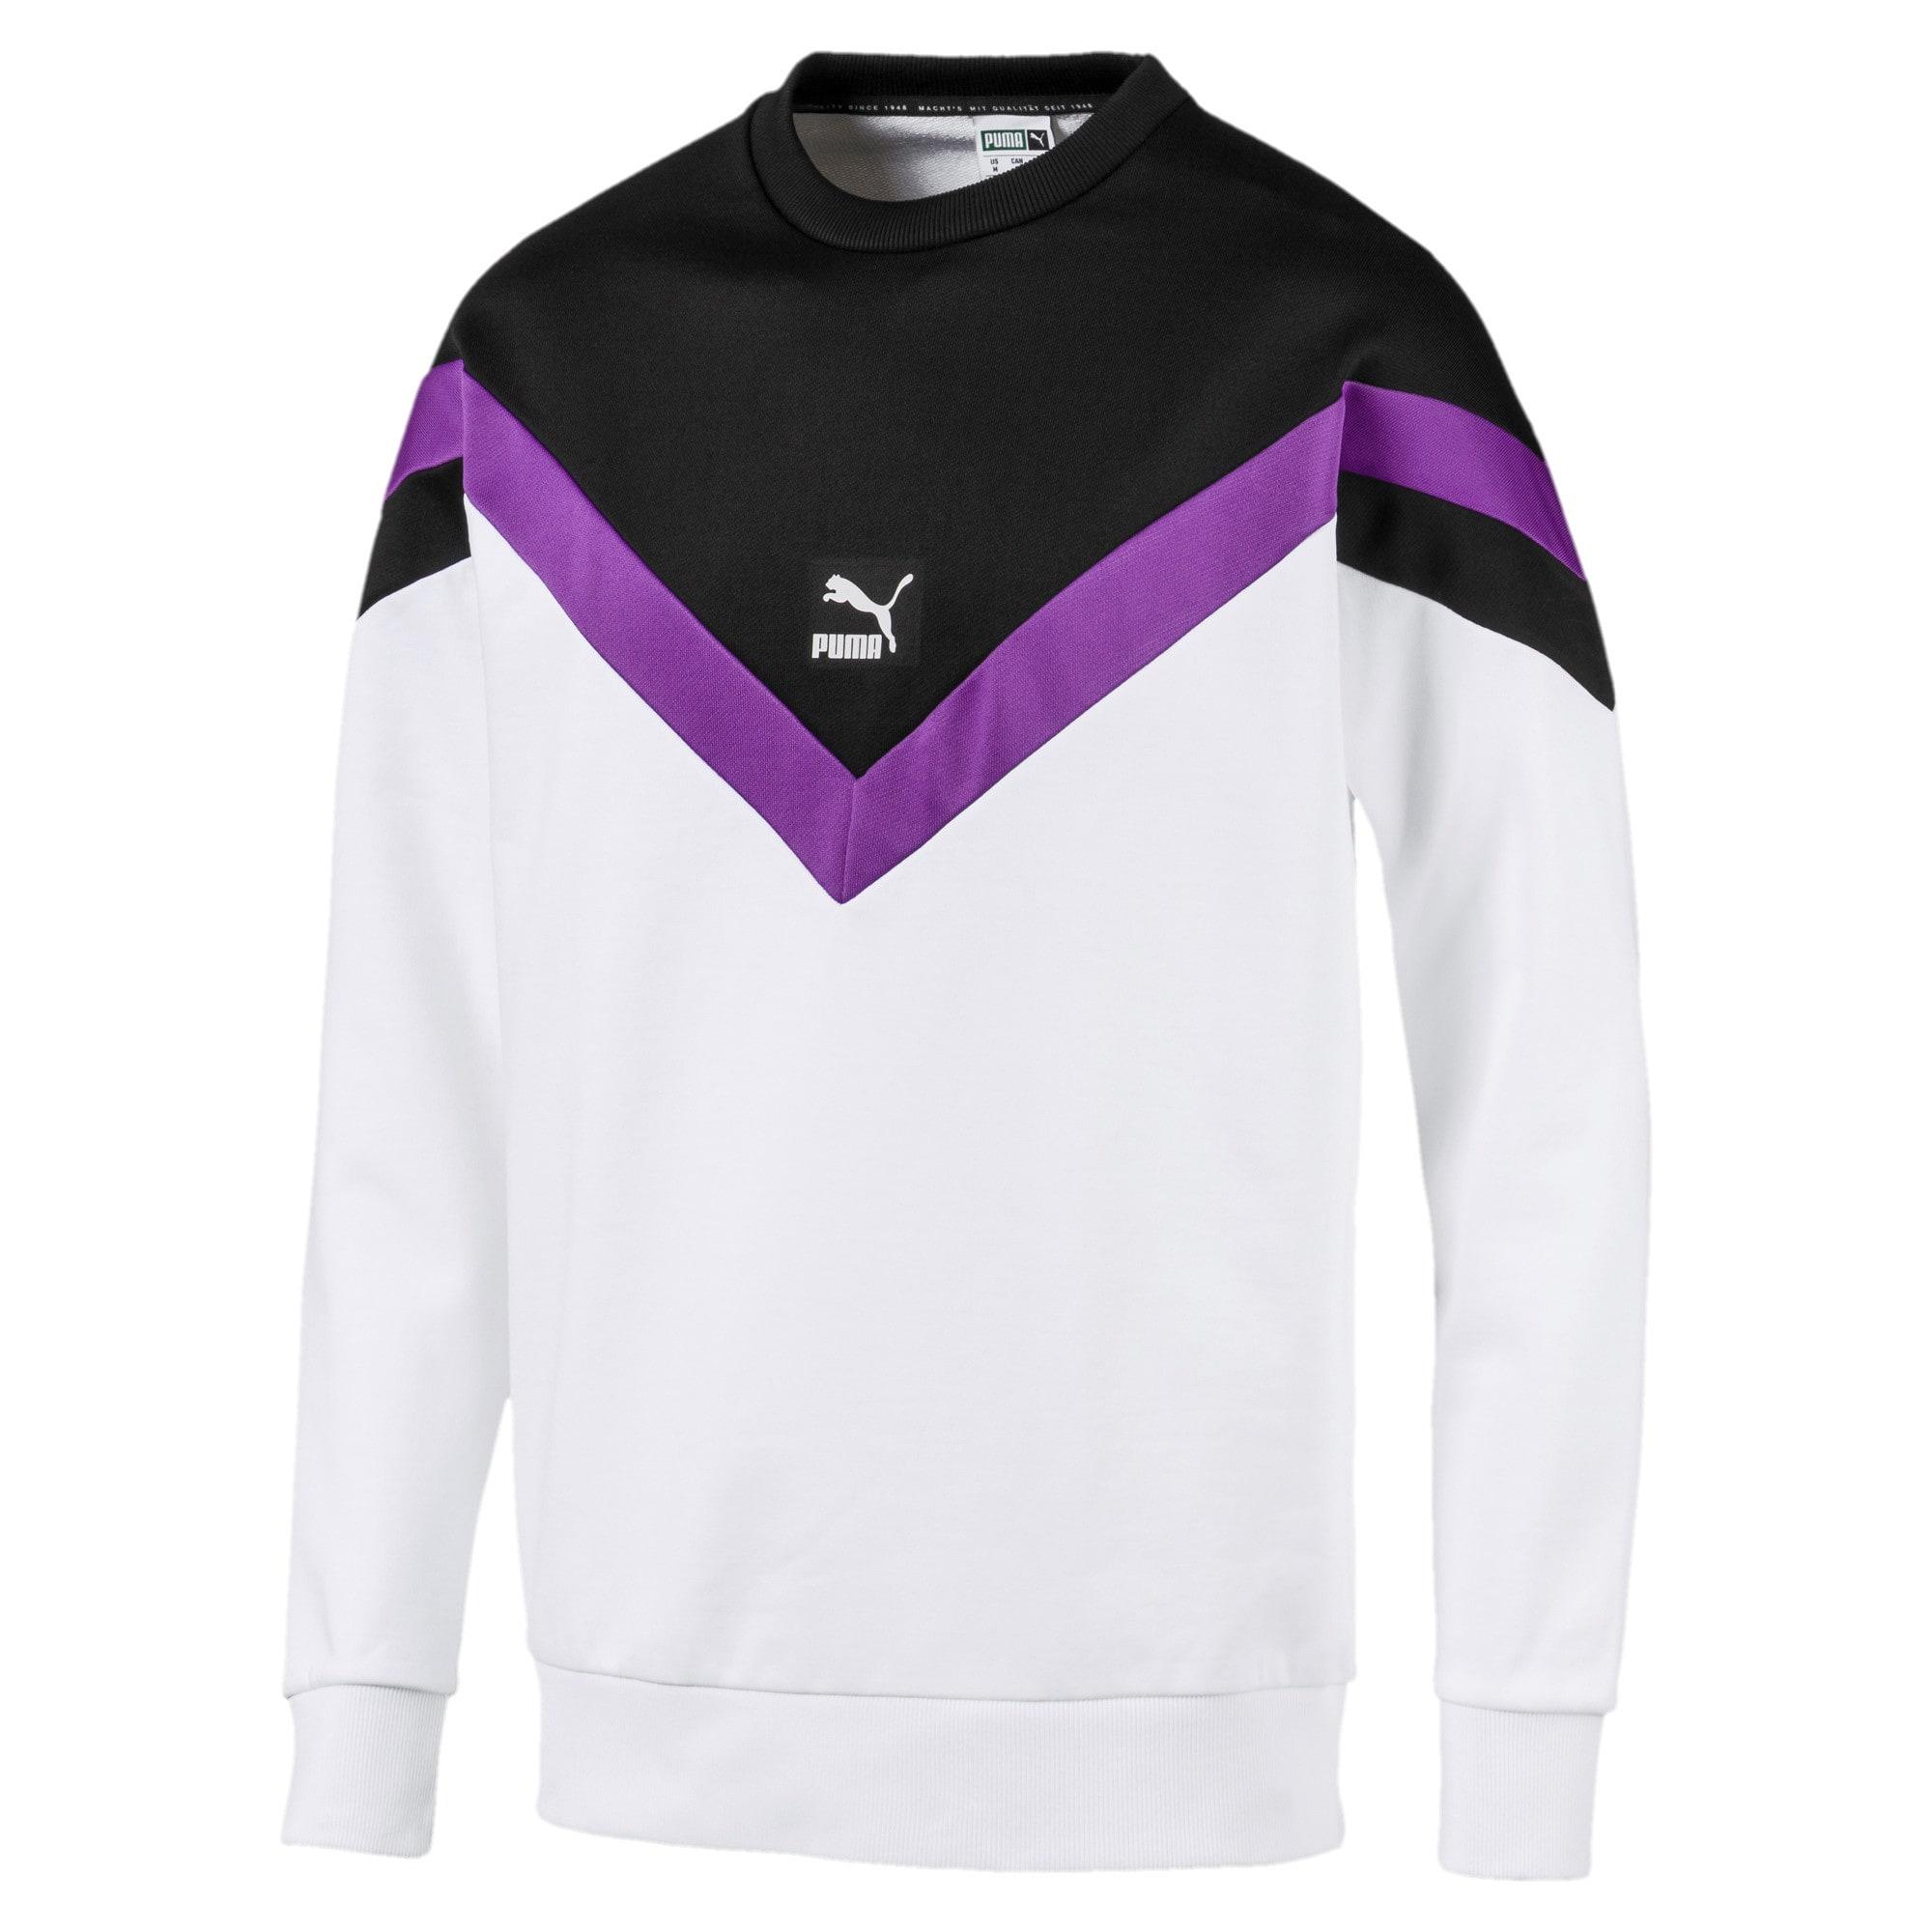 Thumbnail 4 of Iconic MCS Crew Men's Sweater, Puma White, medium